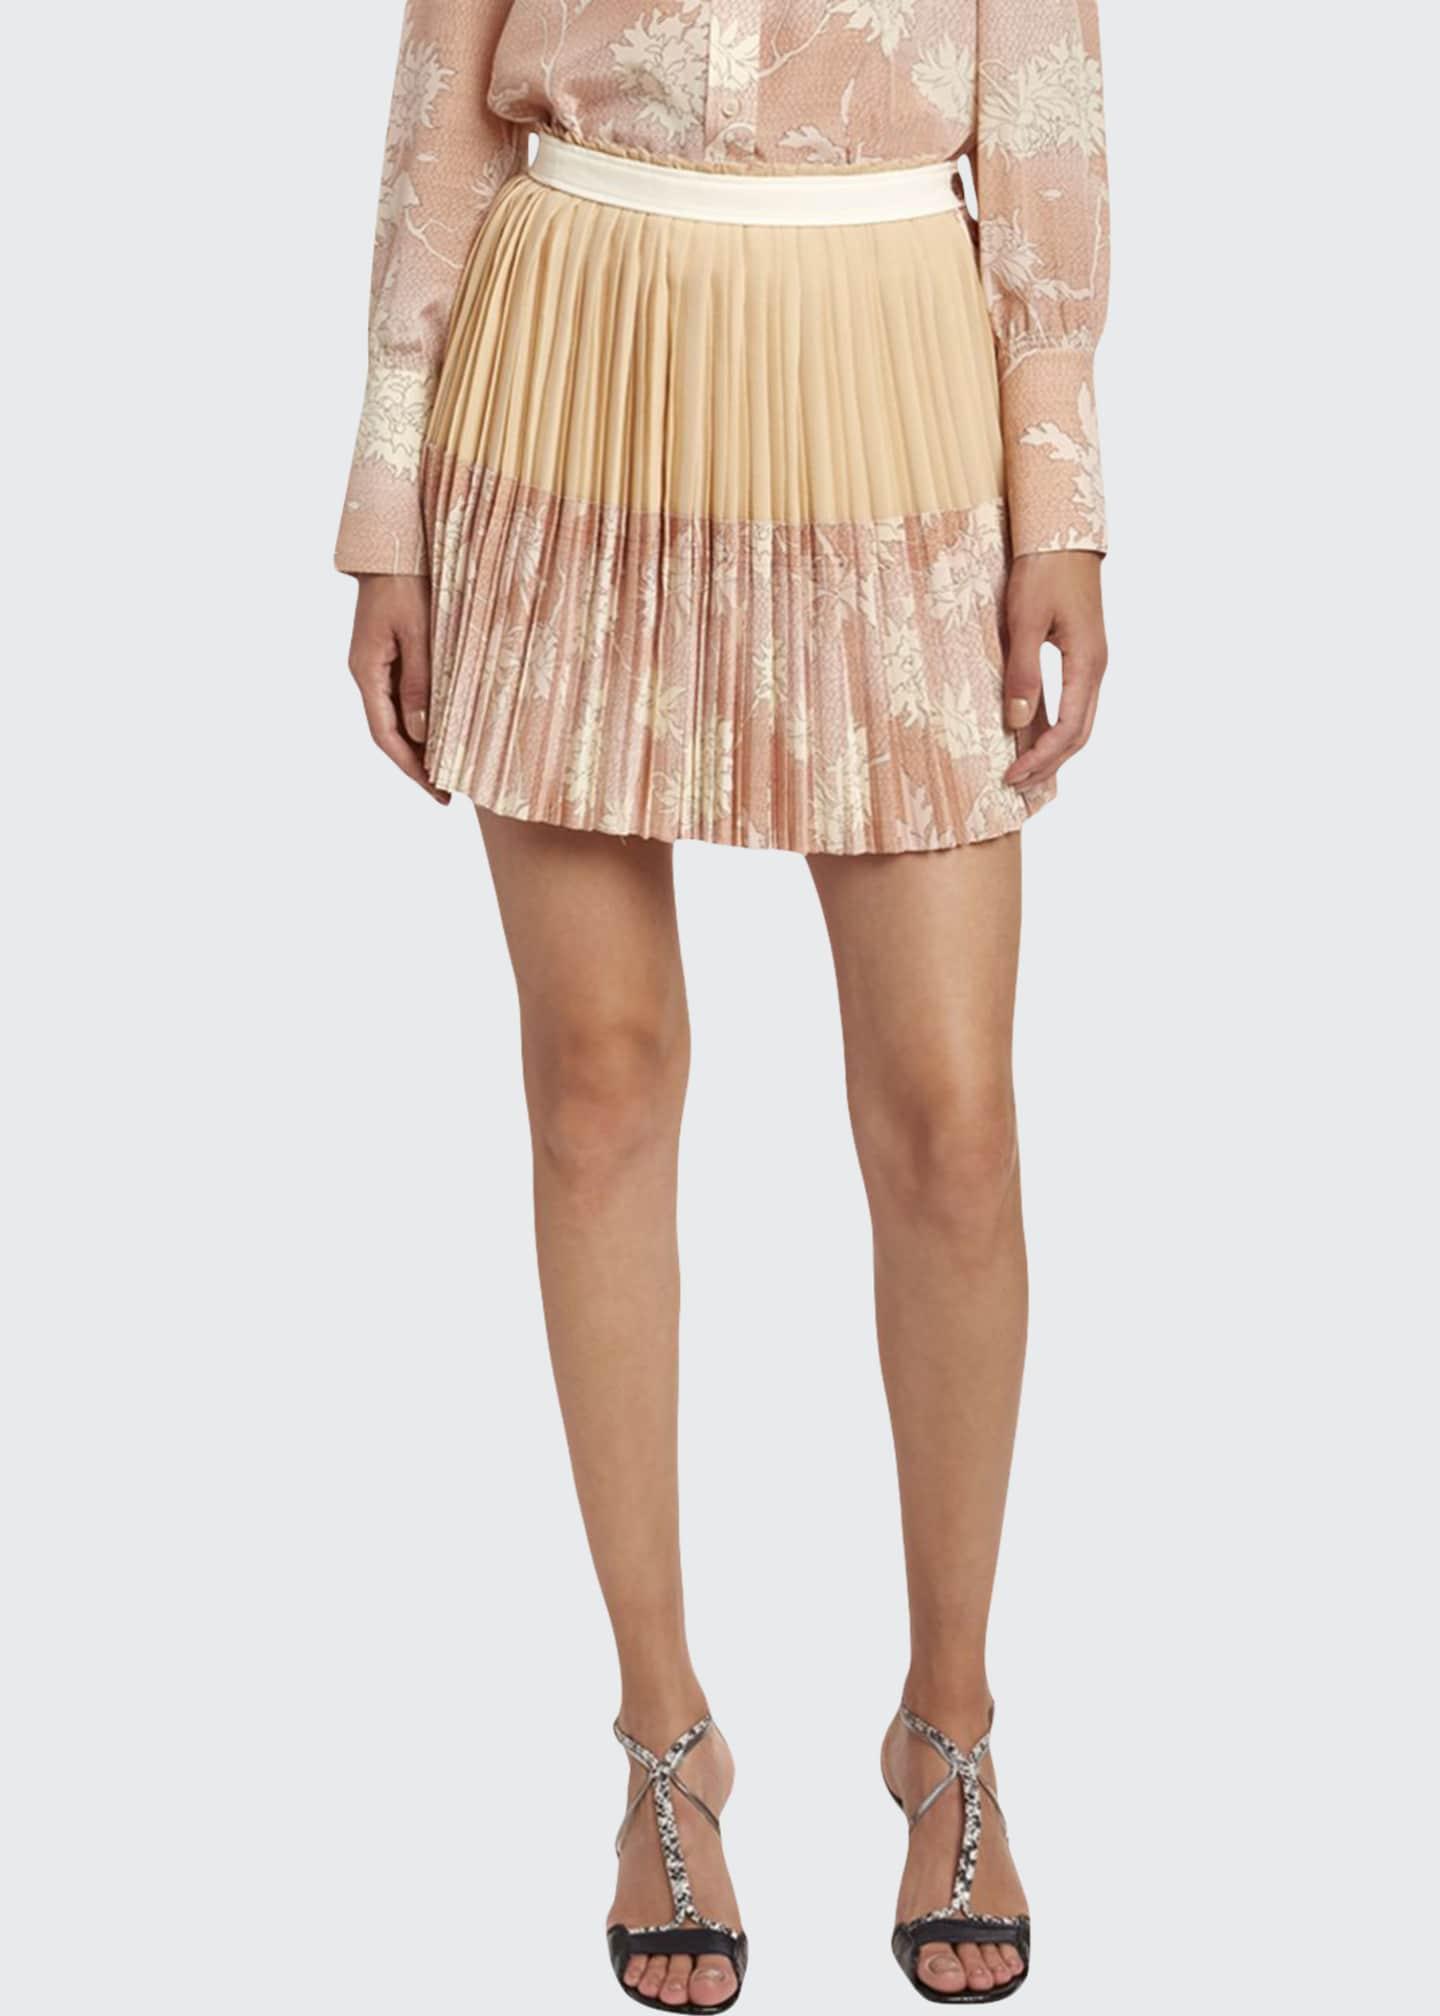 Chloe Scale Print Crepe de Chine Skirt